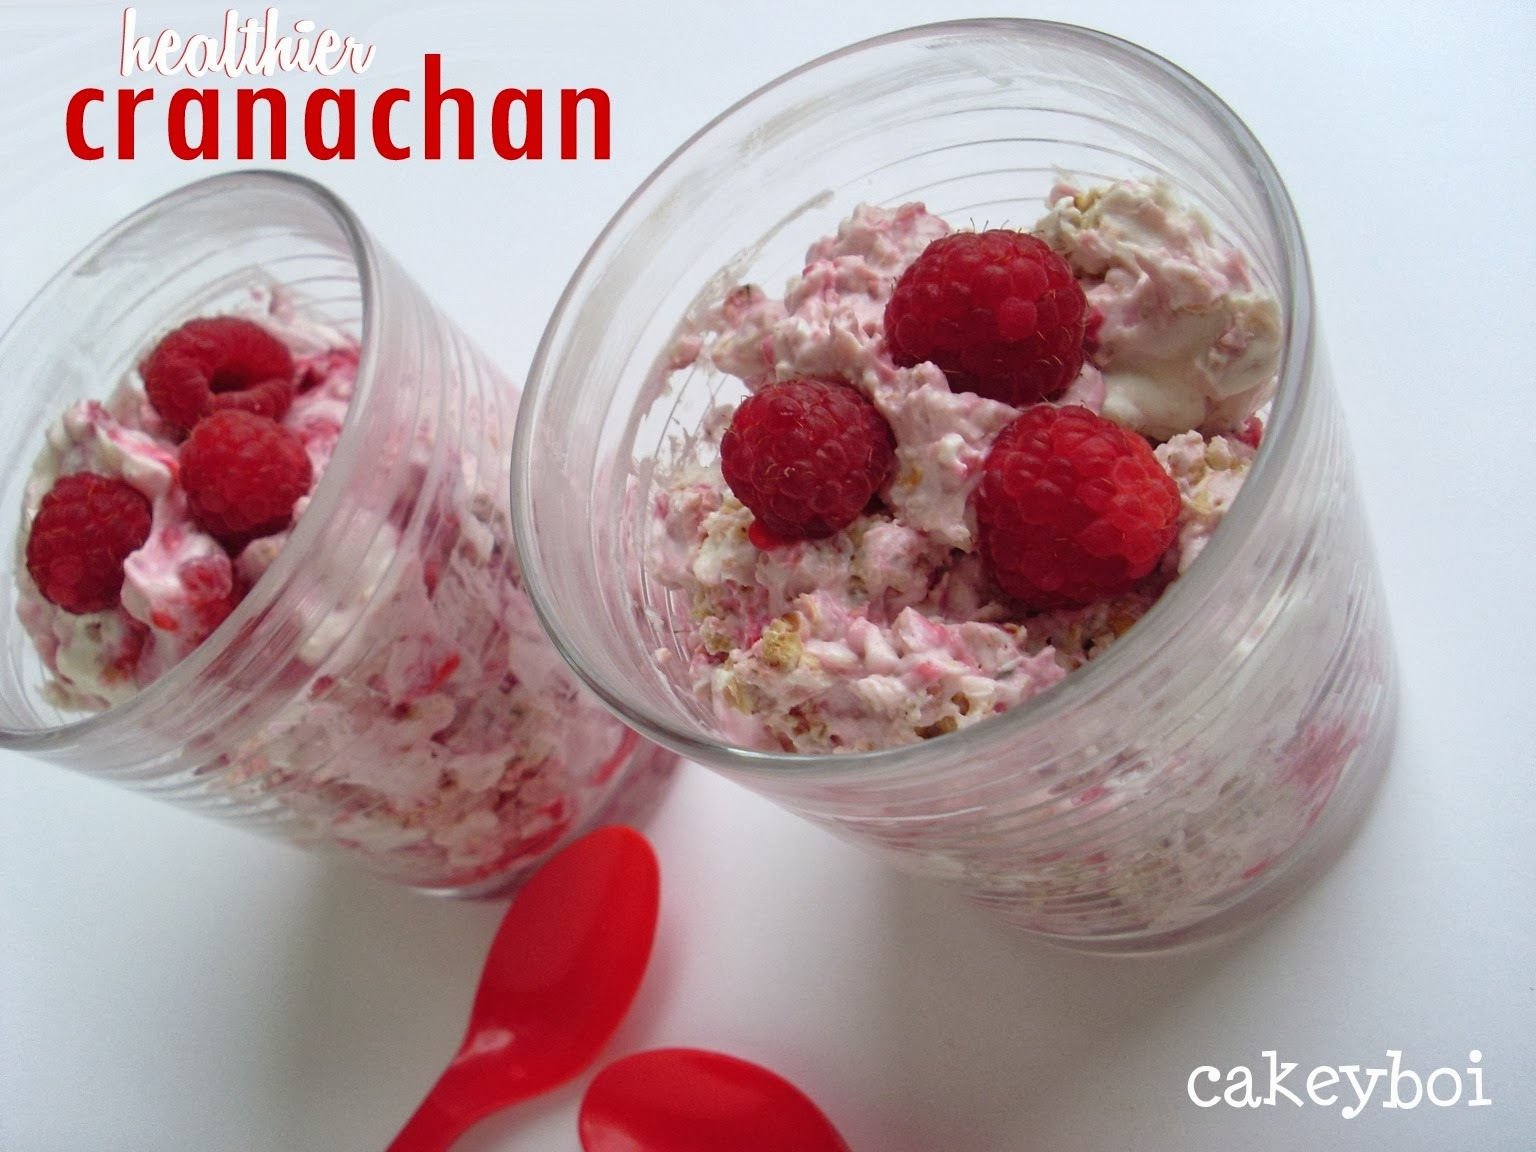 Healthier Cranachan for Burn's Night